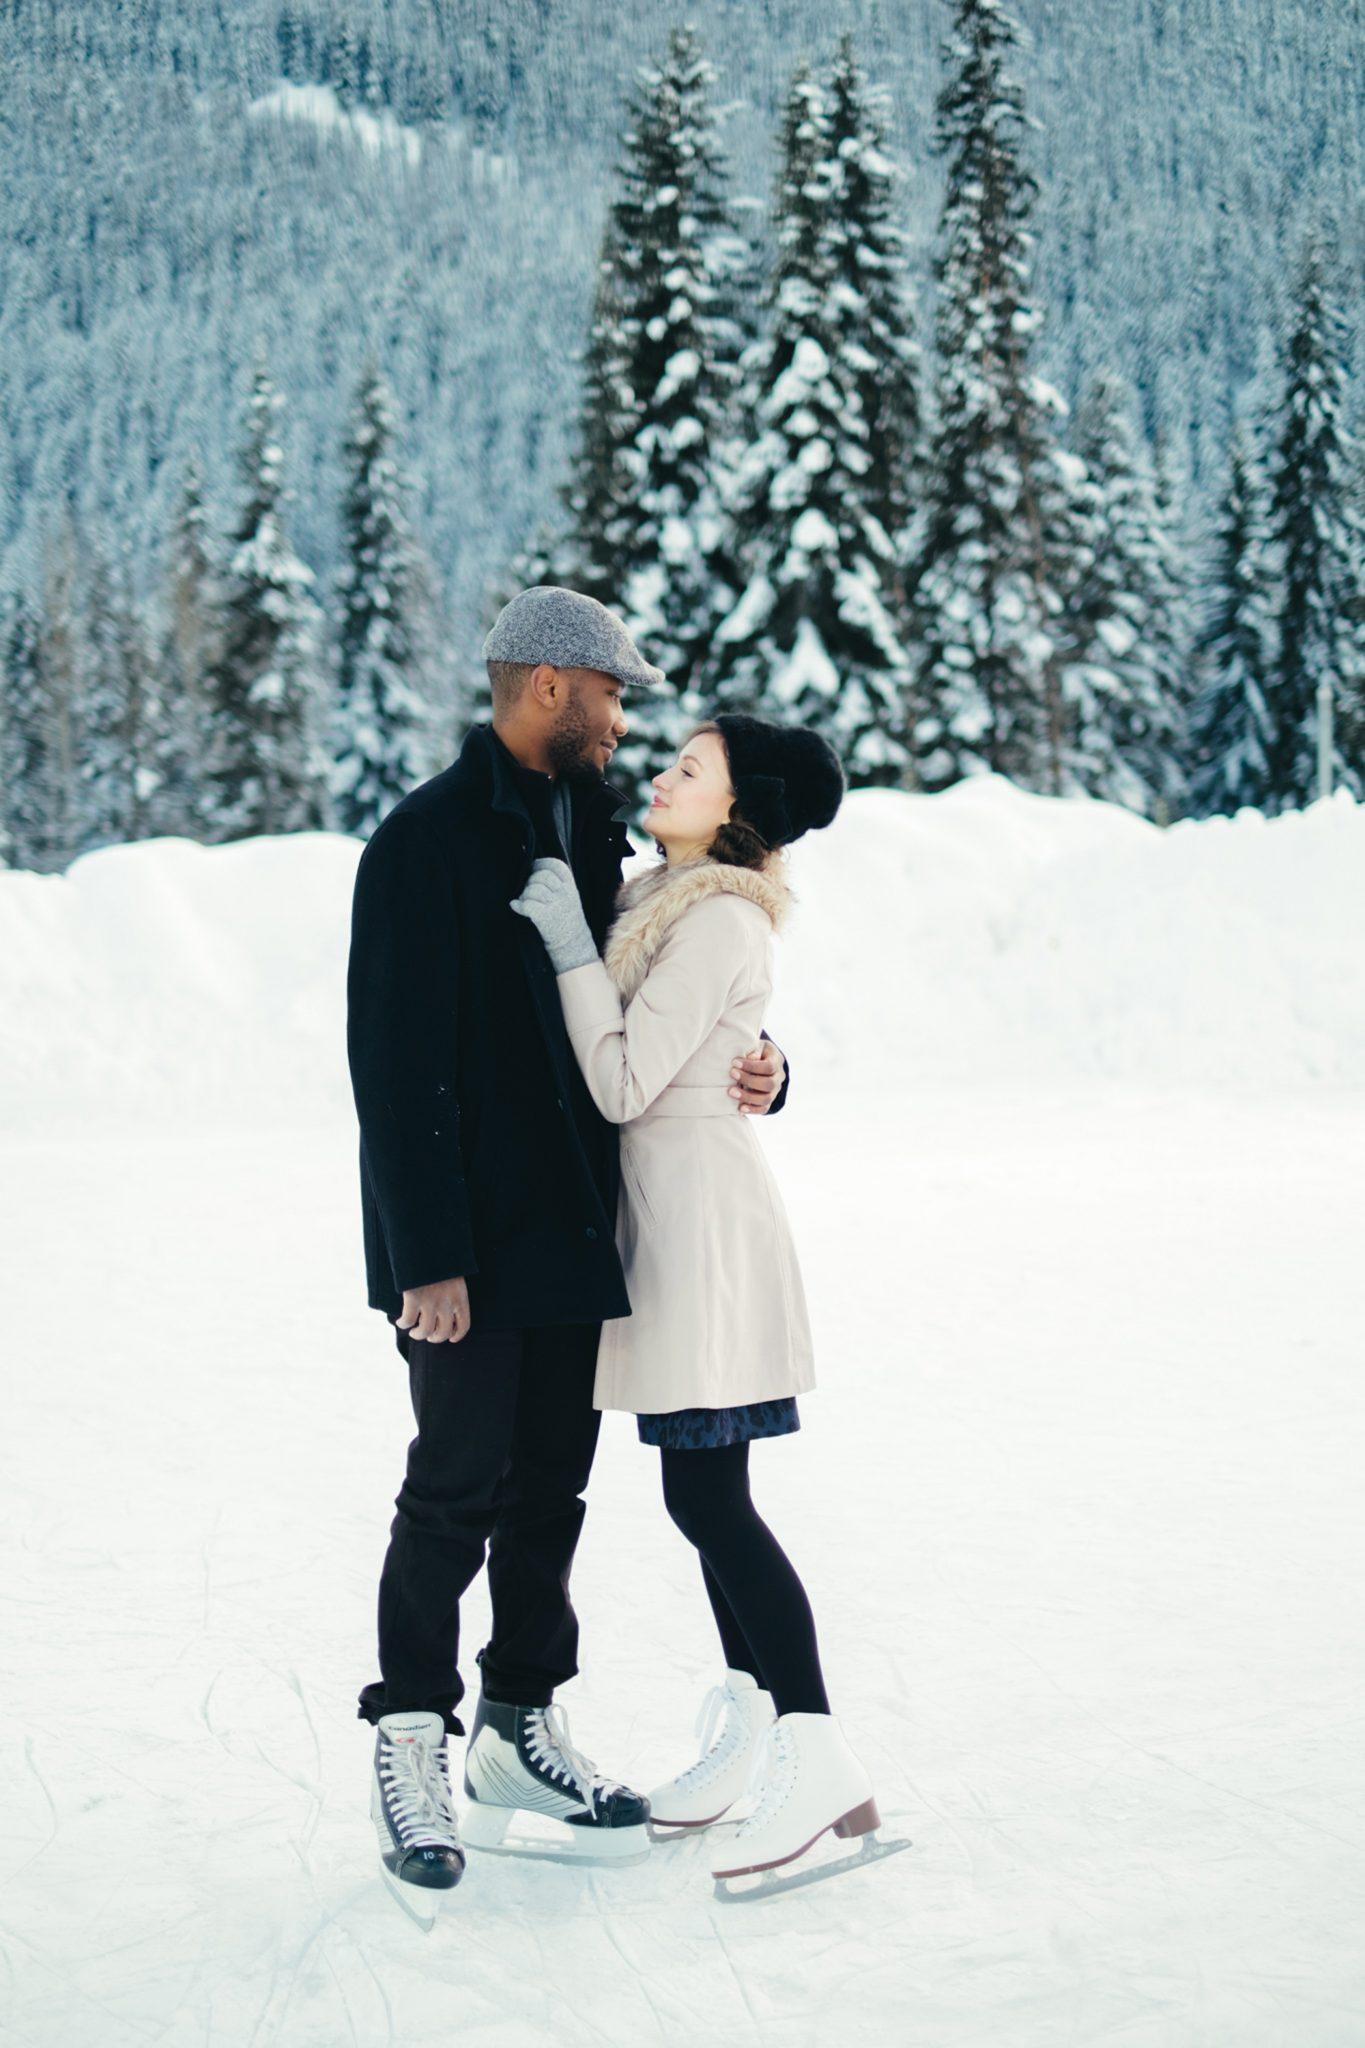 058-adventure-engagement-photographer